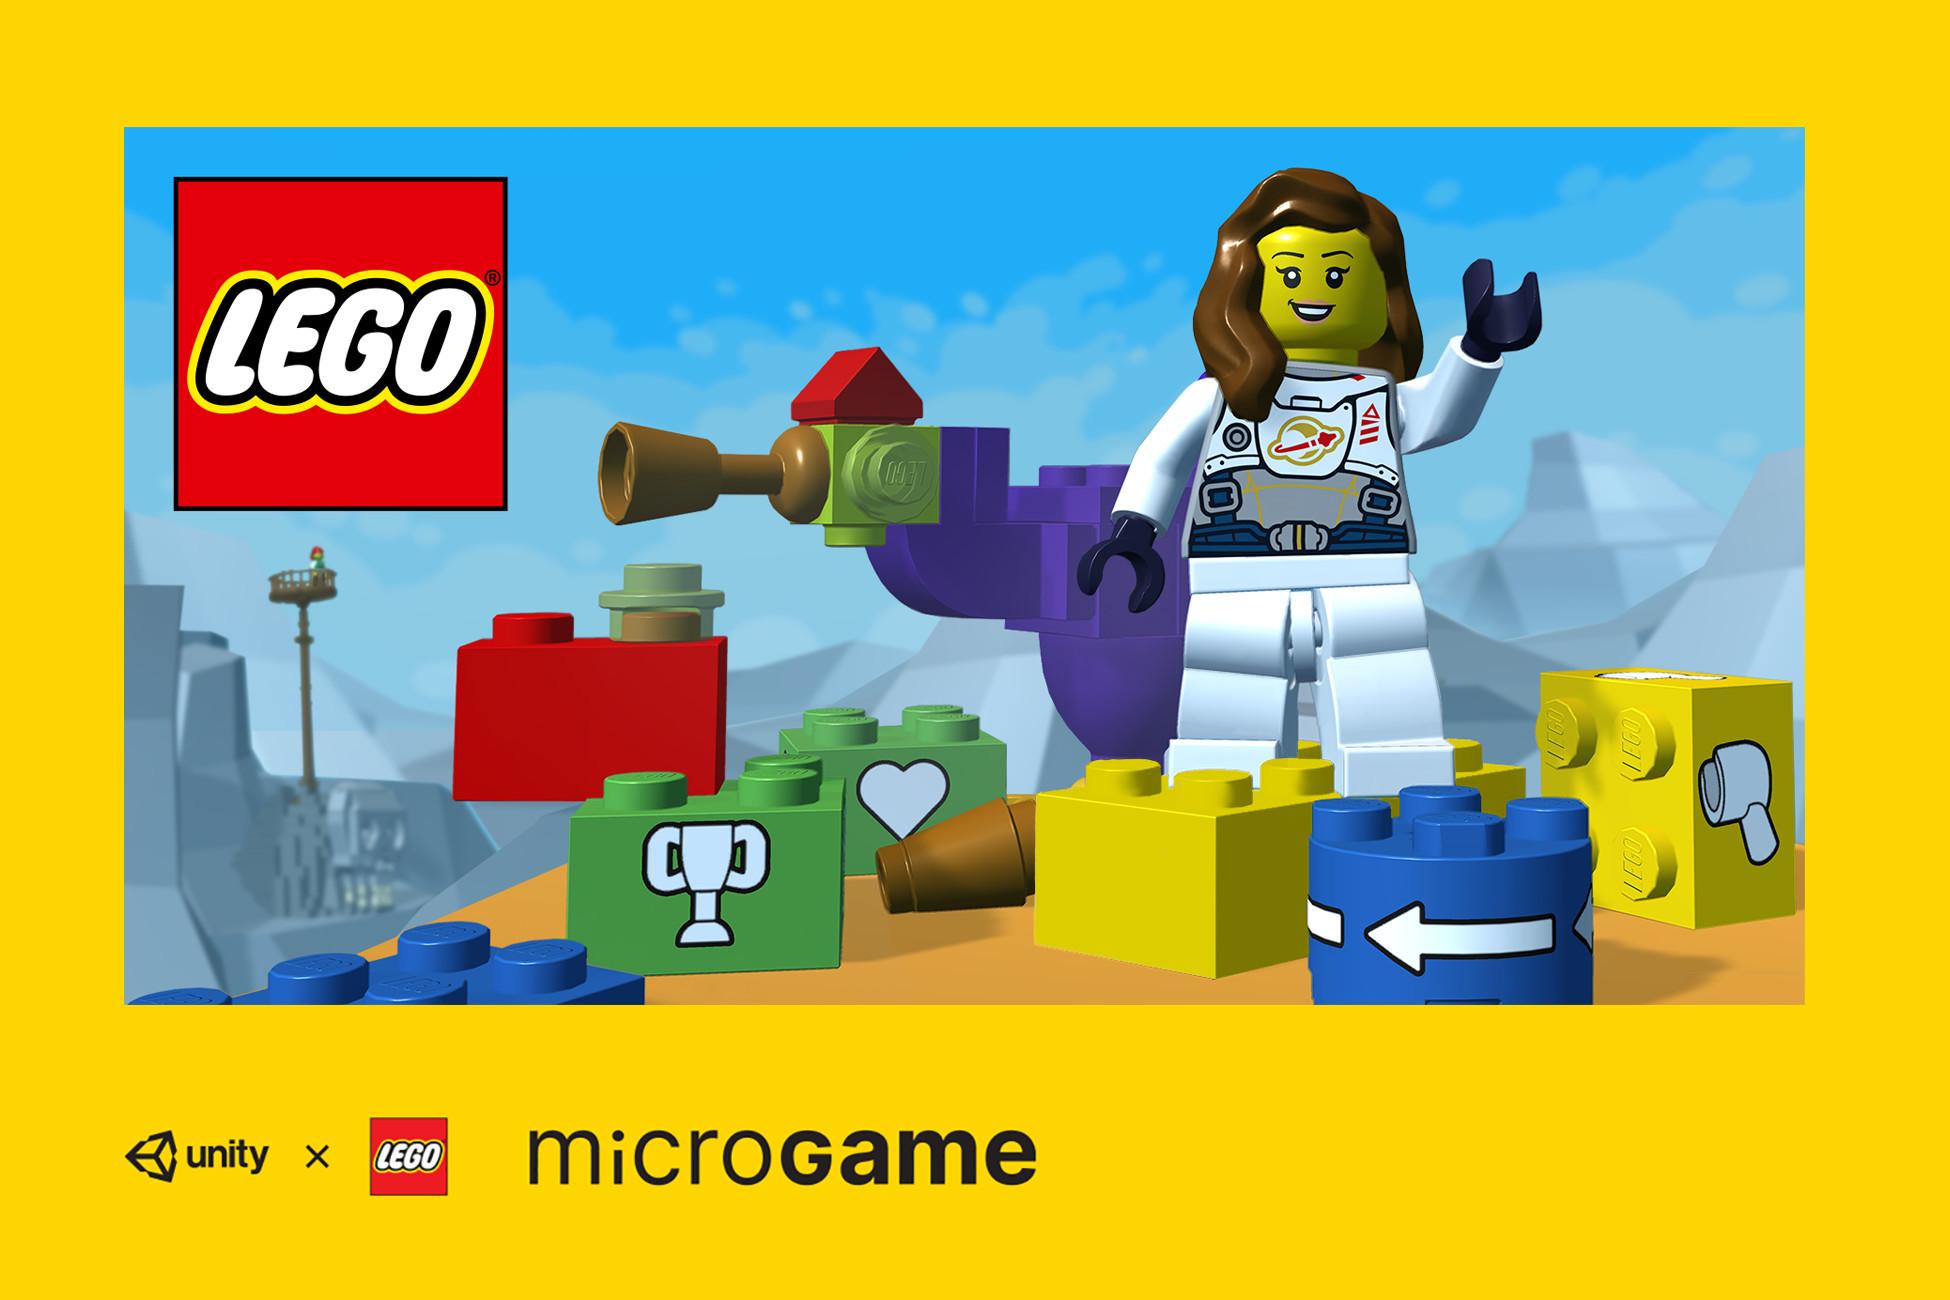 ¡Construye tu propio videojuego con Microgame Lego!